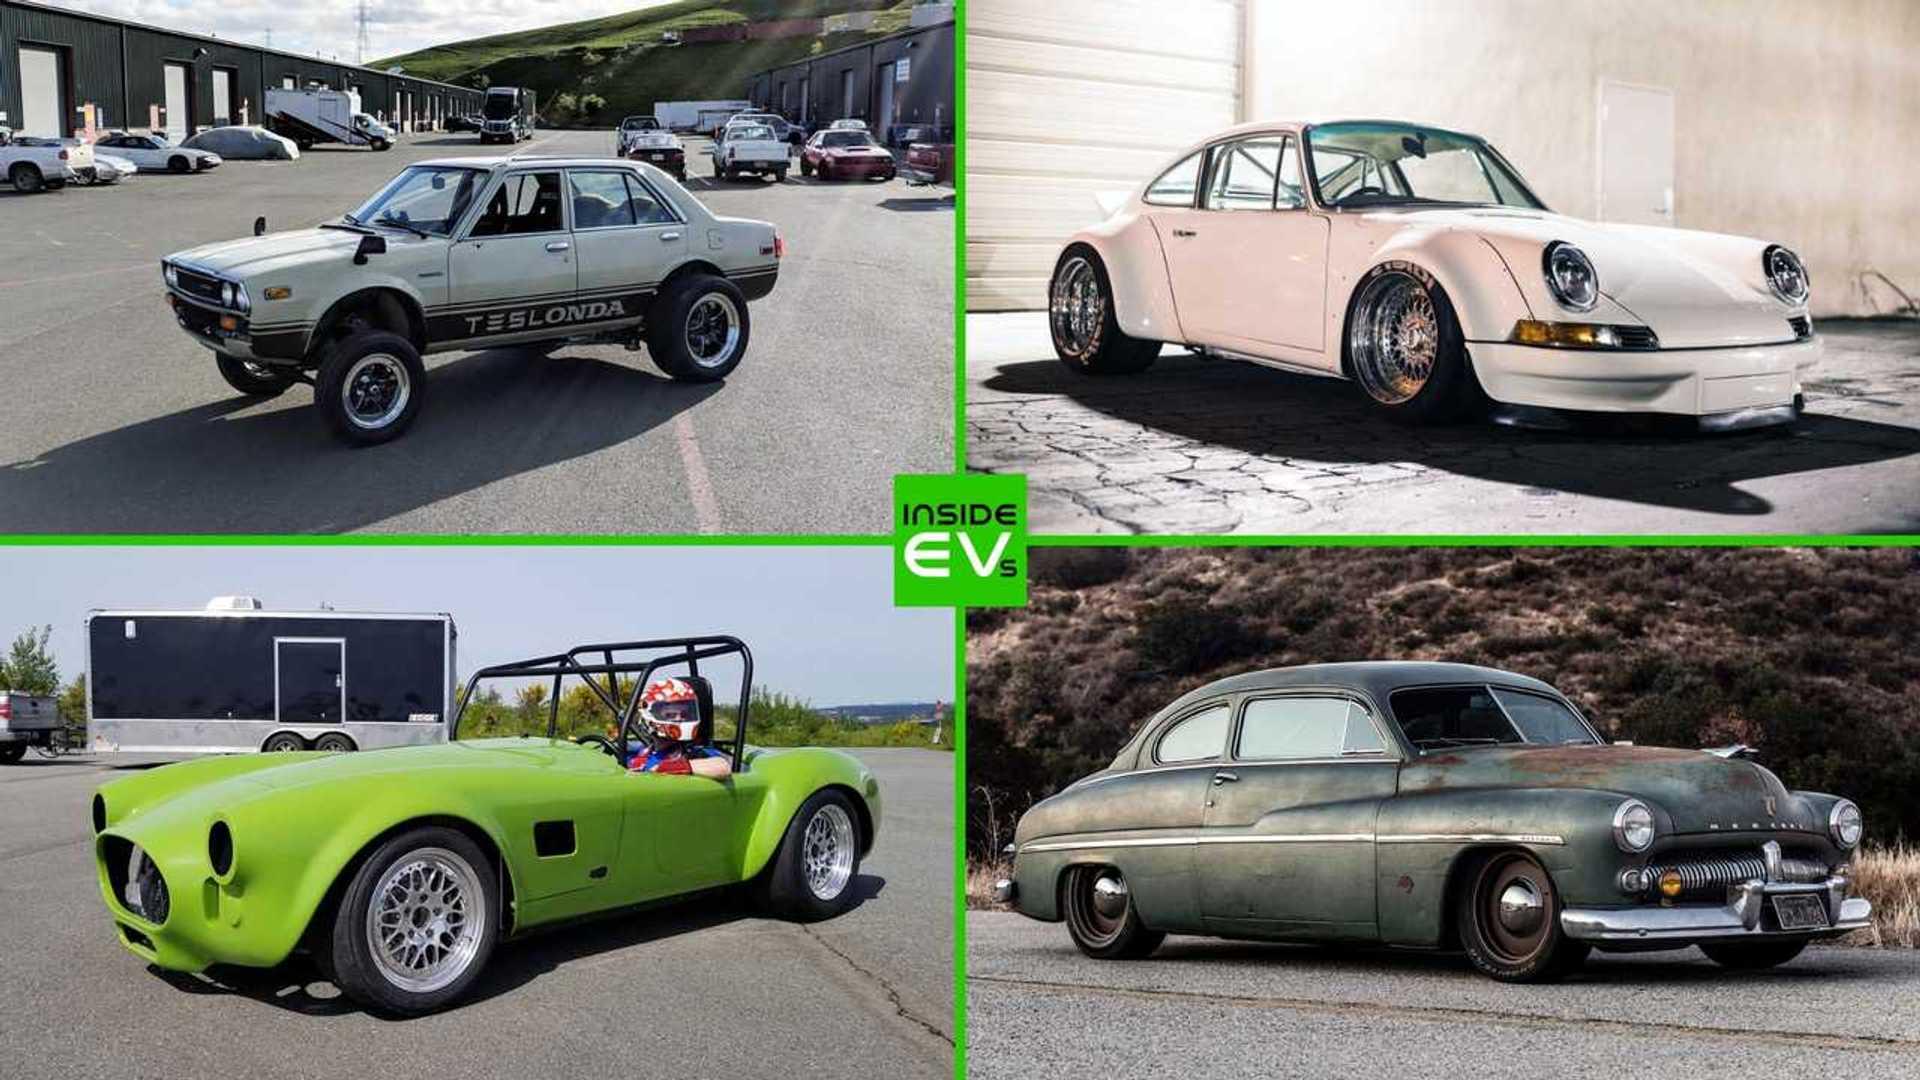 Top 10 Tesla-powered electric car conversions